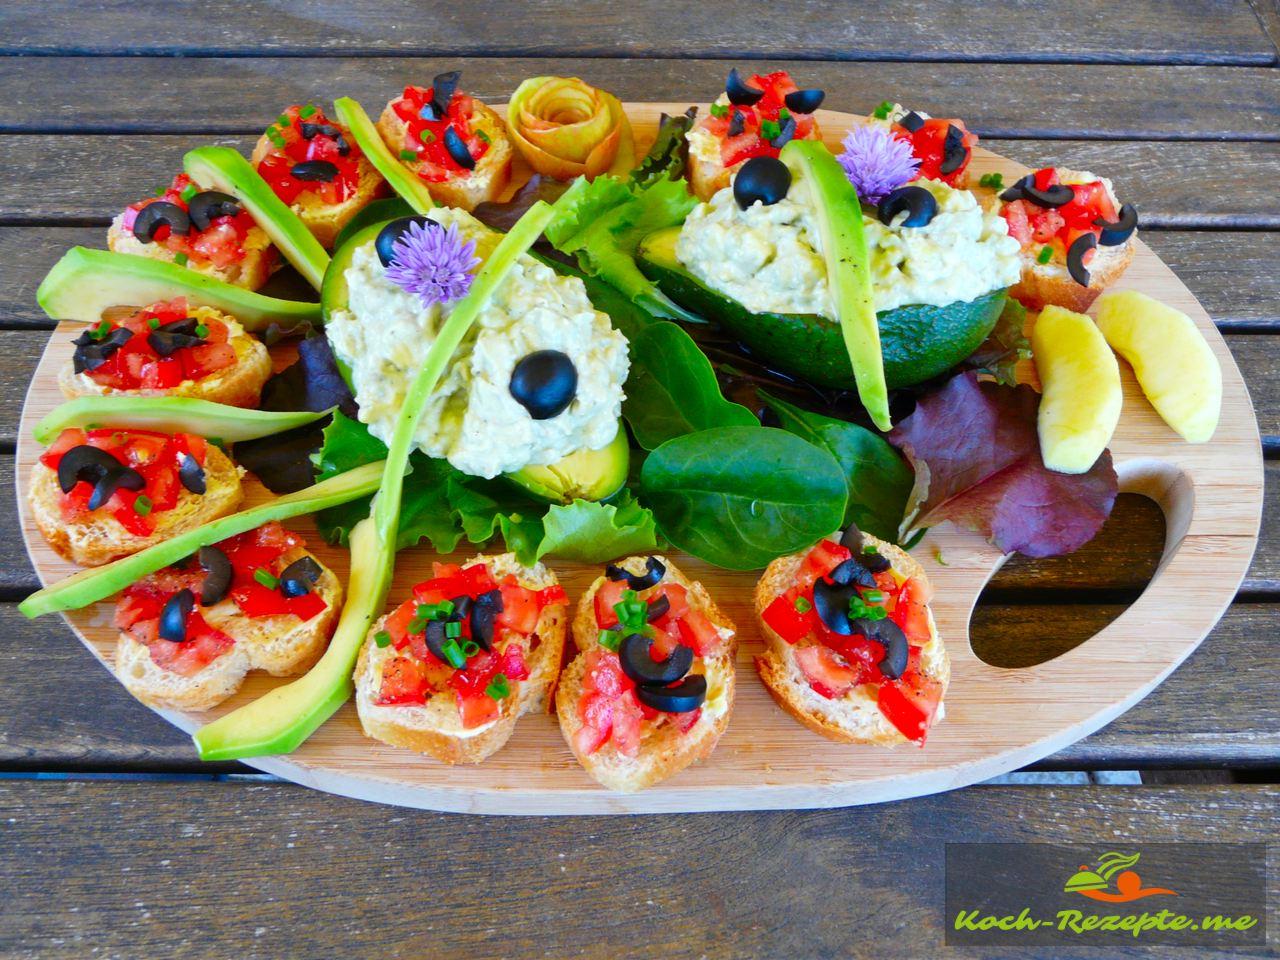 Avocado-Roquefortcreme